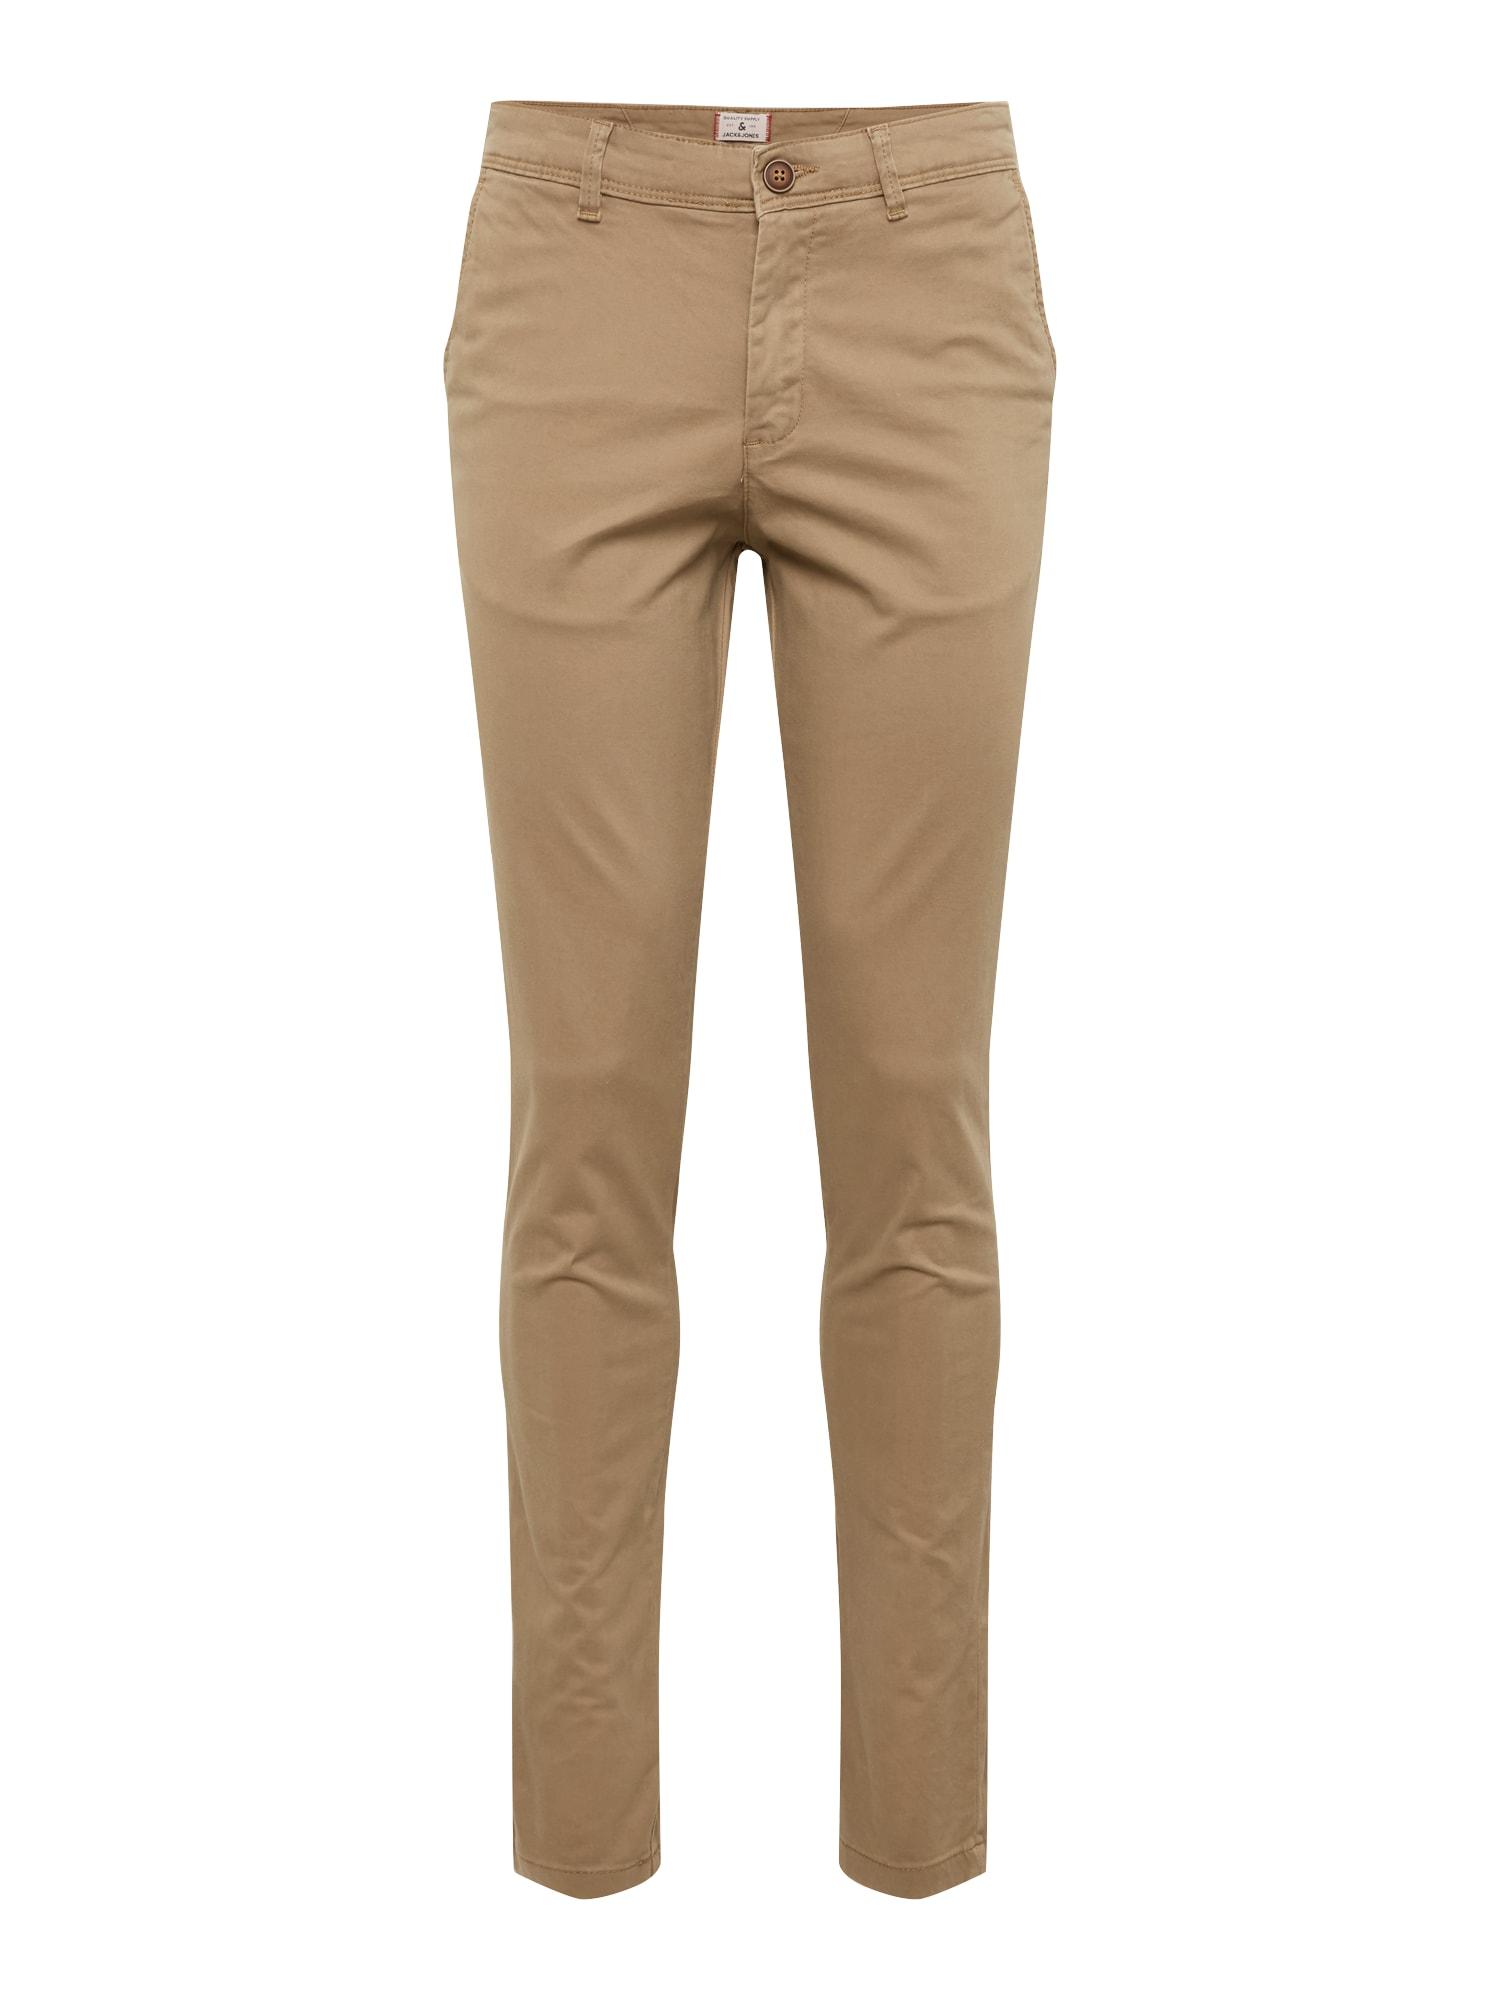 Chino kalhoty NOOS - MARCO BOWIE SA BEIGE NOOS světle béžová JACK & JONES